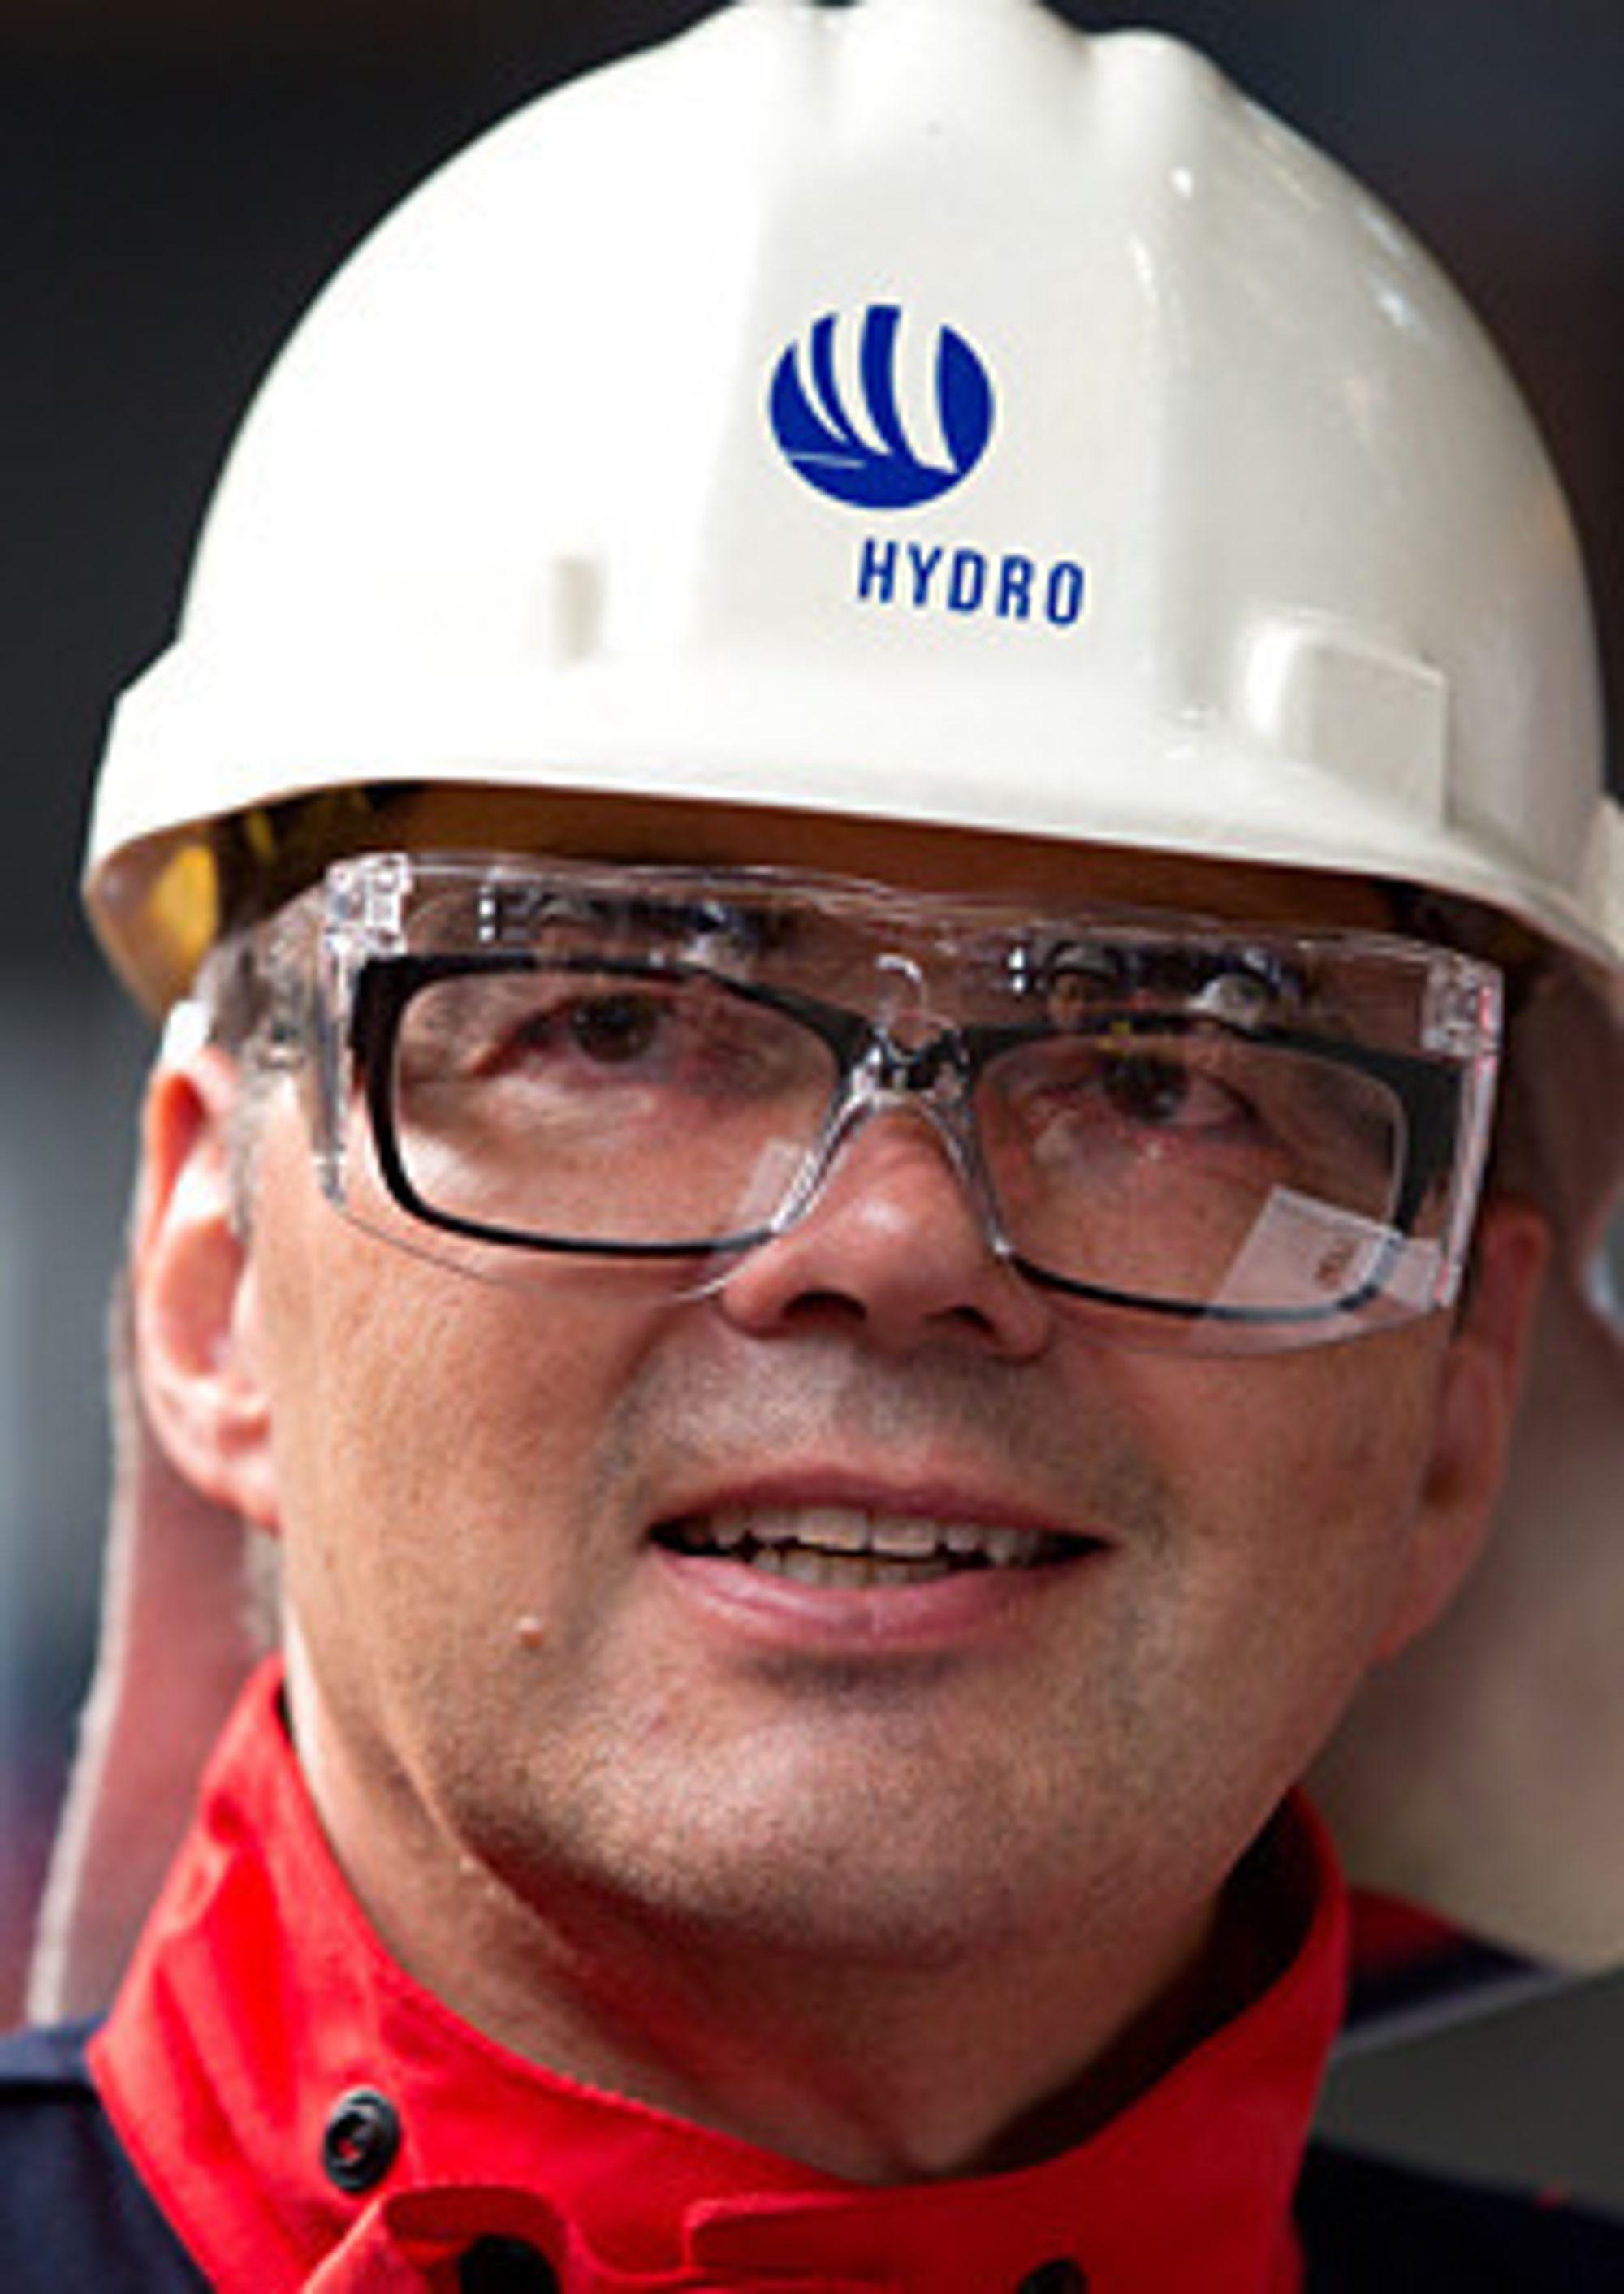 Hydros konsernsjef Svein Richard Brandtzæg har har doktorgrad i kjemi fra NTNU i Trondheim.